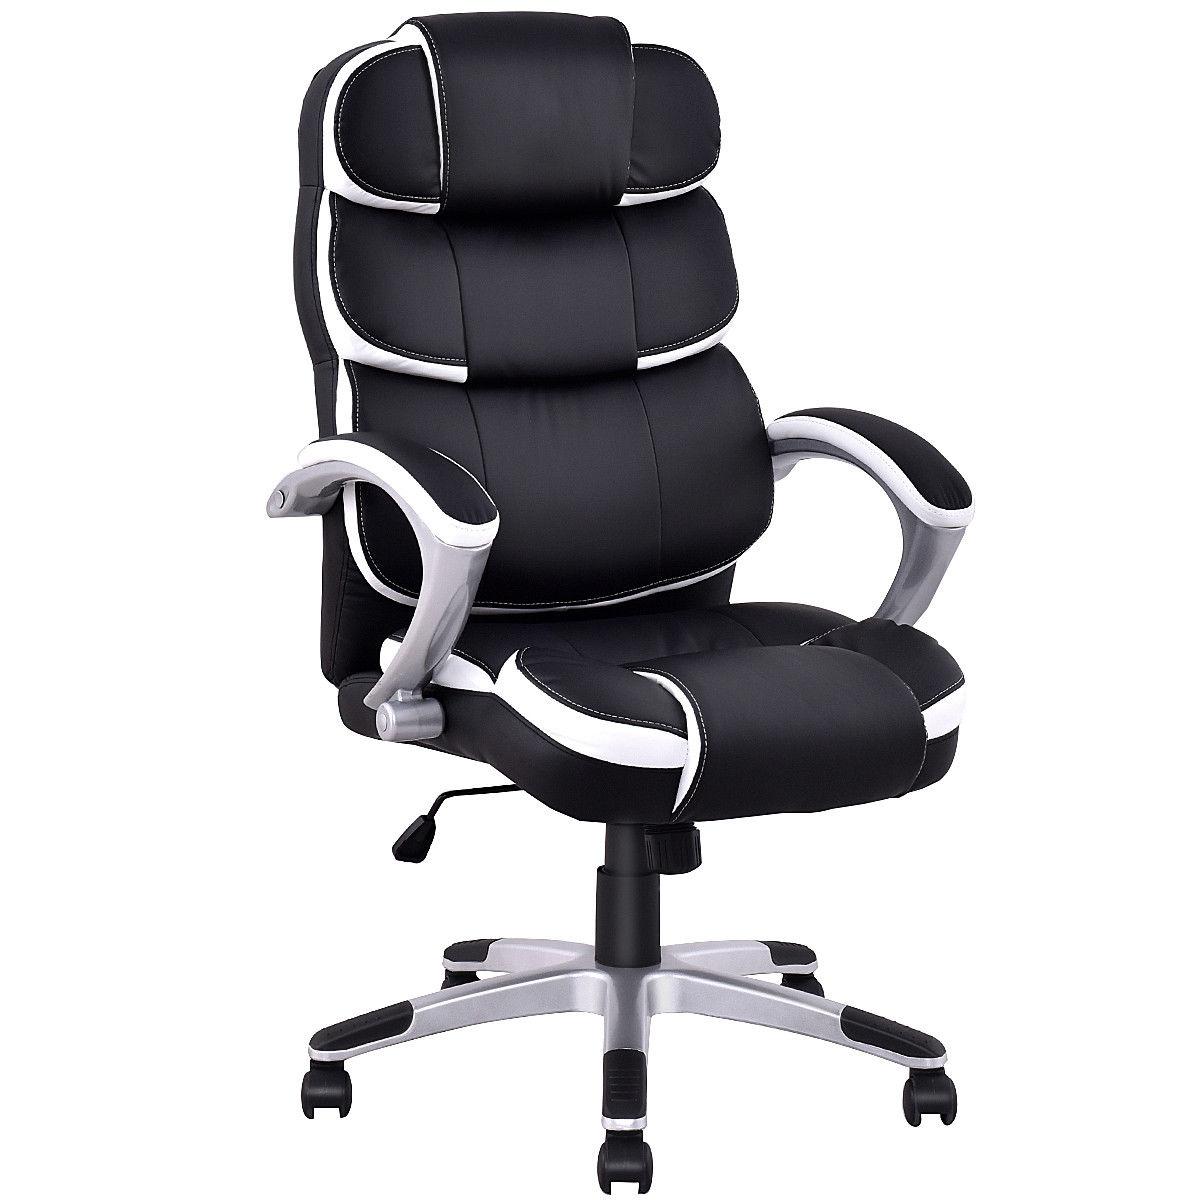 Ergonomic PU Leather High Back Computer Chair-Black